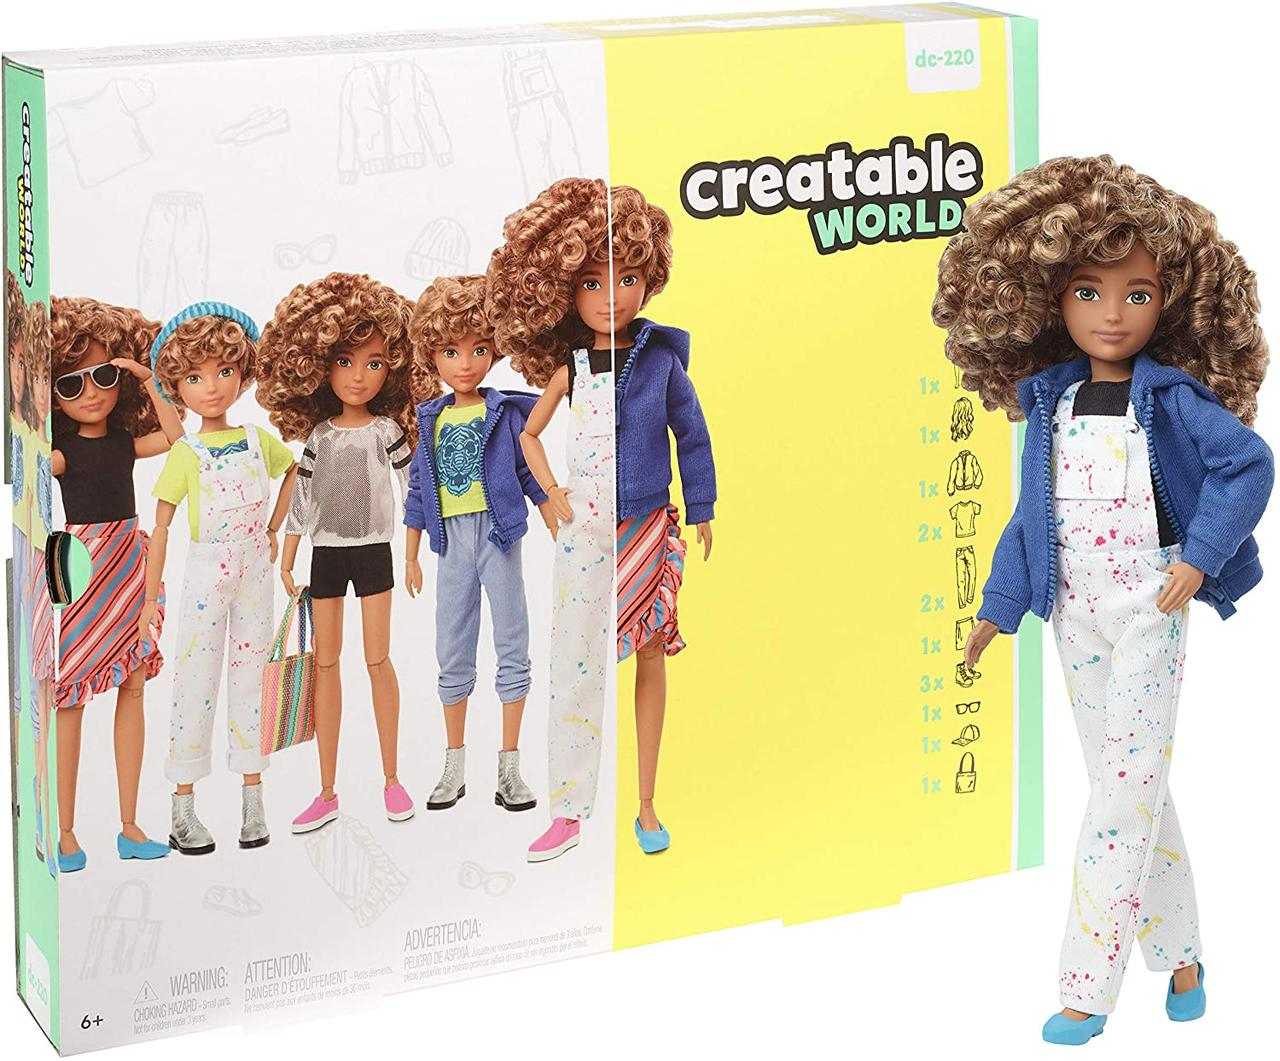 Кукла Создаваемый мир Светлые кудри Creatable World Character Kit Customizable Doll Blonde Curly Hair